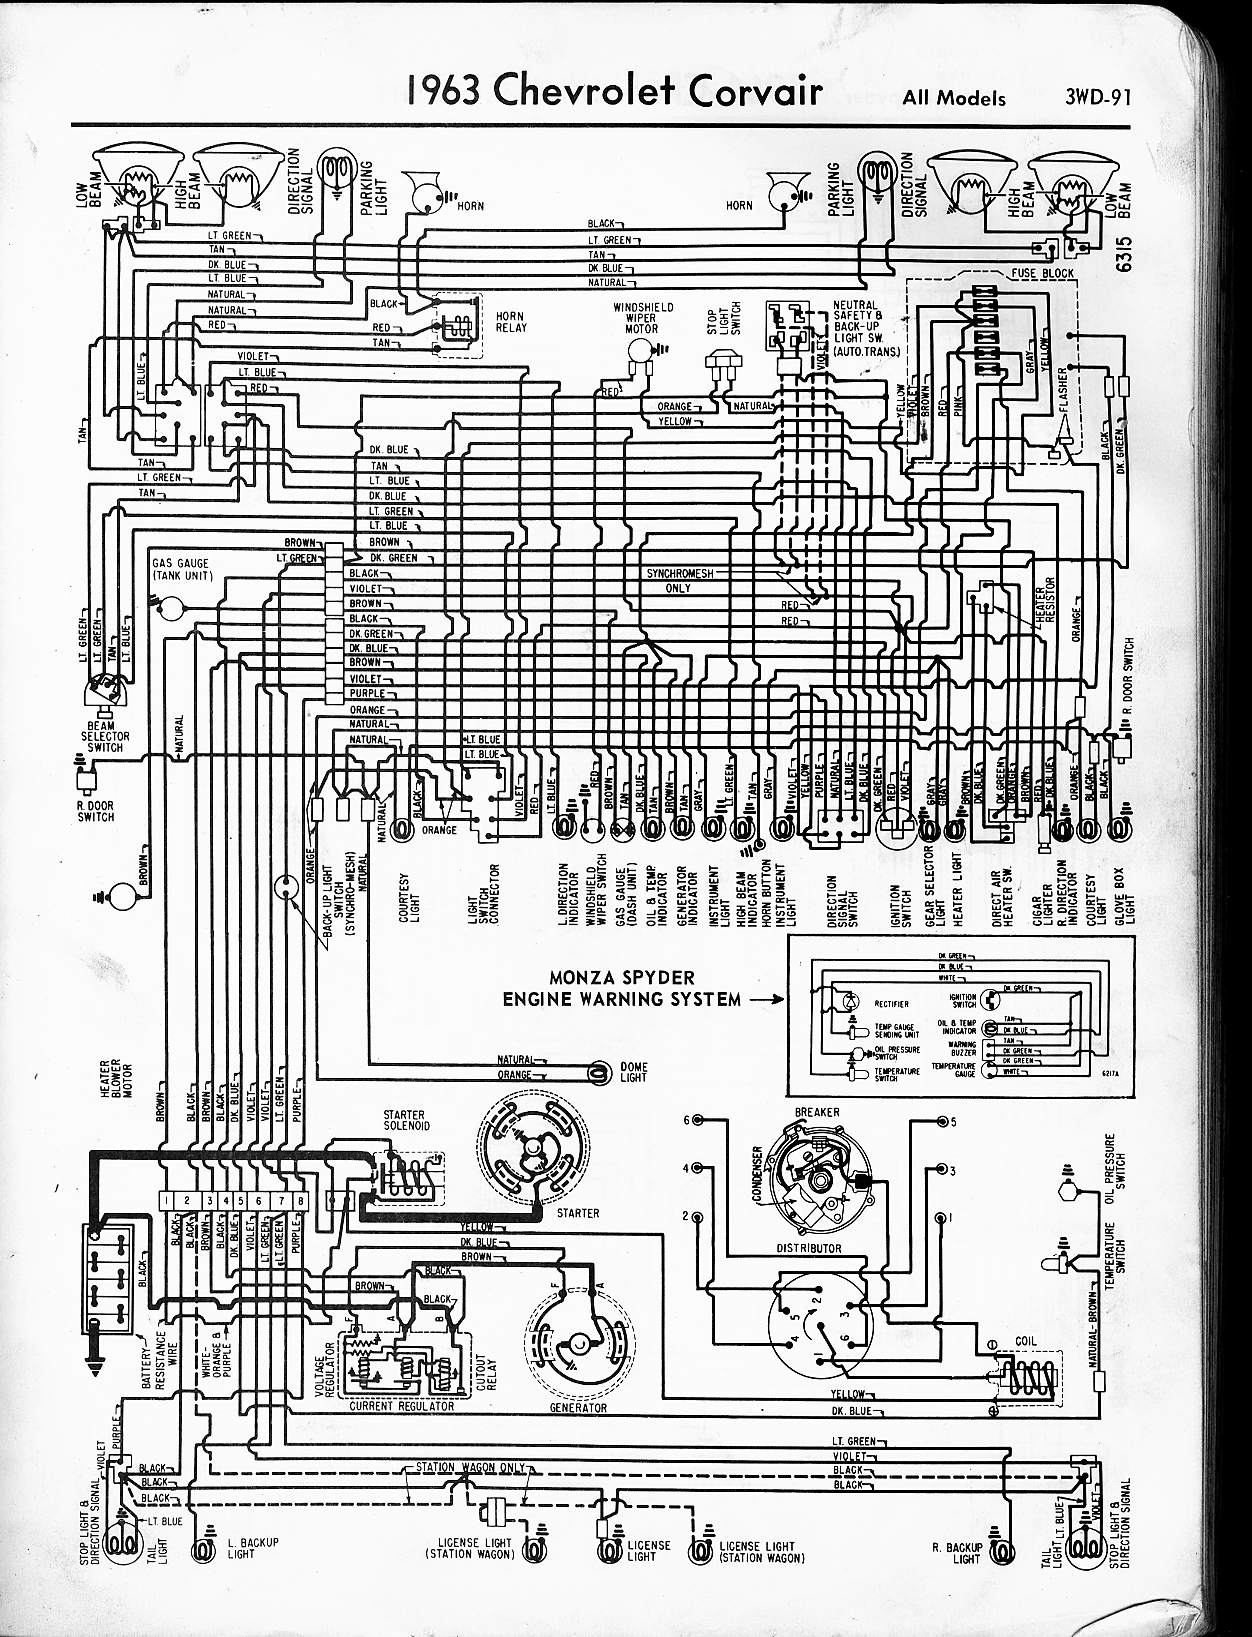 63 Nova Wagon Wiring Diagram - 9.17.tramitesyconsultas.co • Wiring Diagram Nova Ii on 1974 nova wiring diagram, 1972 nova wiring diagram, 1967 nova wiring diagram, chevy nova wiring diagram, 1964 nova wiring diagram, 1975 nova wiring diagram, 1971 nova wiring diagram, 1962 nova wiring diagram, 1970 nova wiring diagram, 1966 nova wiring diagram, 70 nova wiring diagram, 1963 nova fuel gauge, 66 nova wiring diagram, 1973 nova wiring diagram, 1969 nova wiring diagram, 72 nova wiring diagram, 1965 nova wiring diagram, 1963 nova air cleaner, 71 nova wiring diagram, 1968 nova wiring diagram,